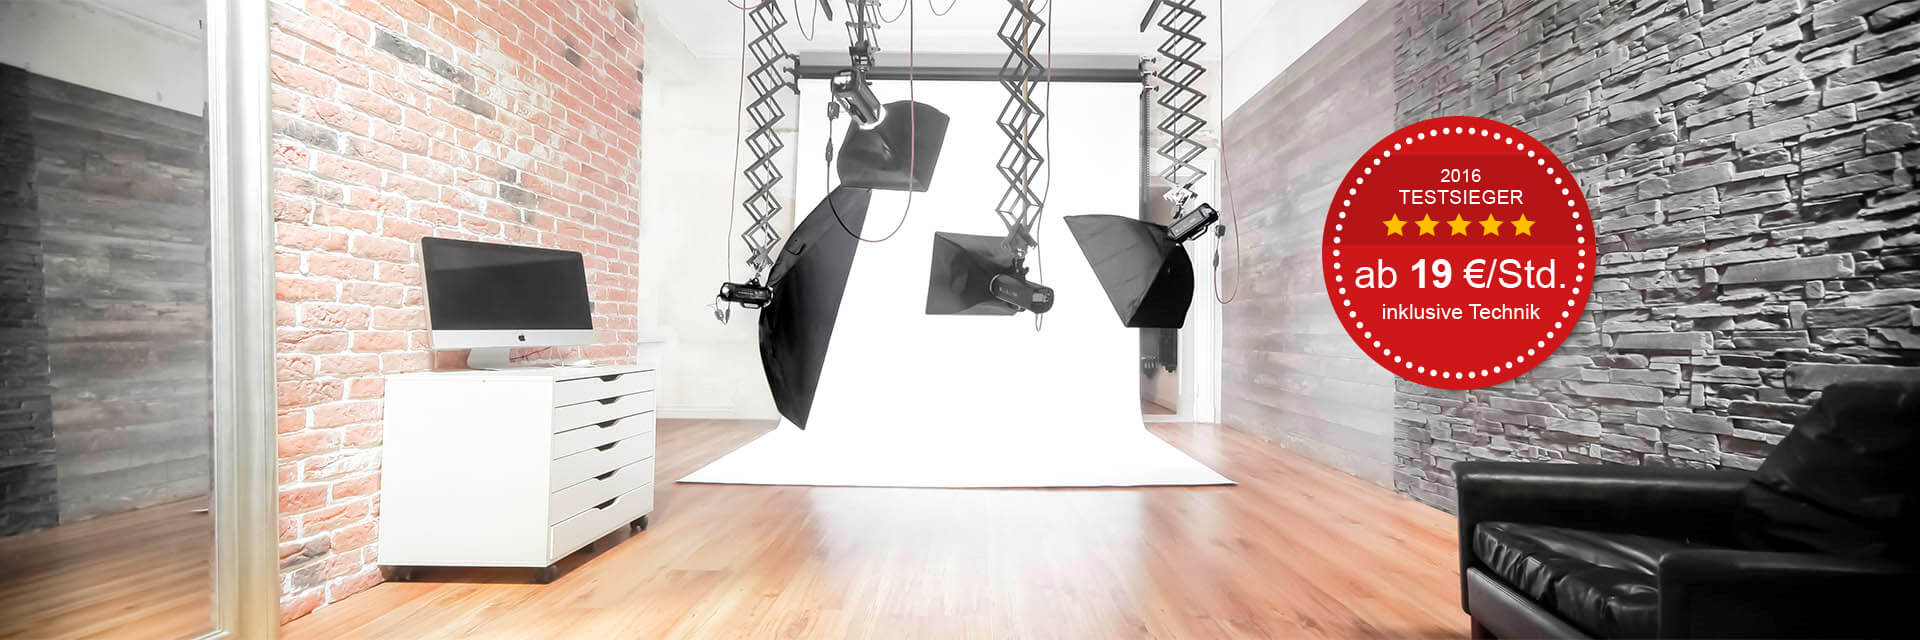 mieten berlin cool fr std fr std transporter mieten ohne kaution in berlin with mieten berlin. Black Bedroom Furniture Sets. Home Design Ideas